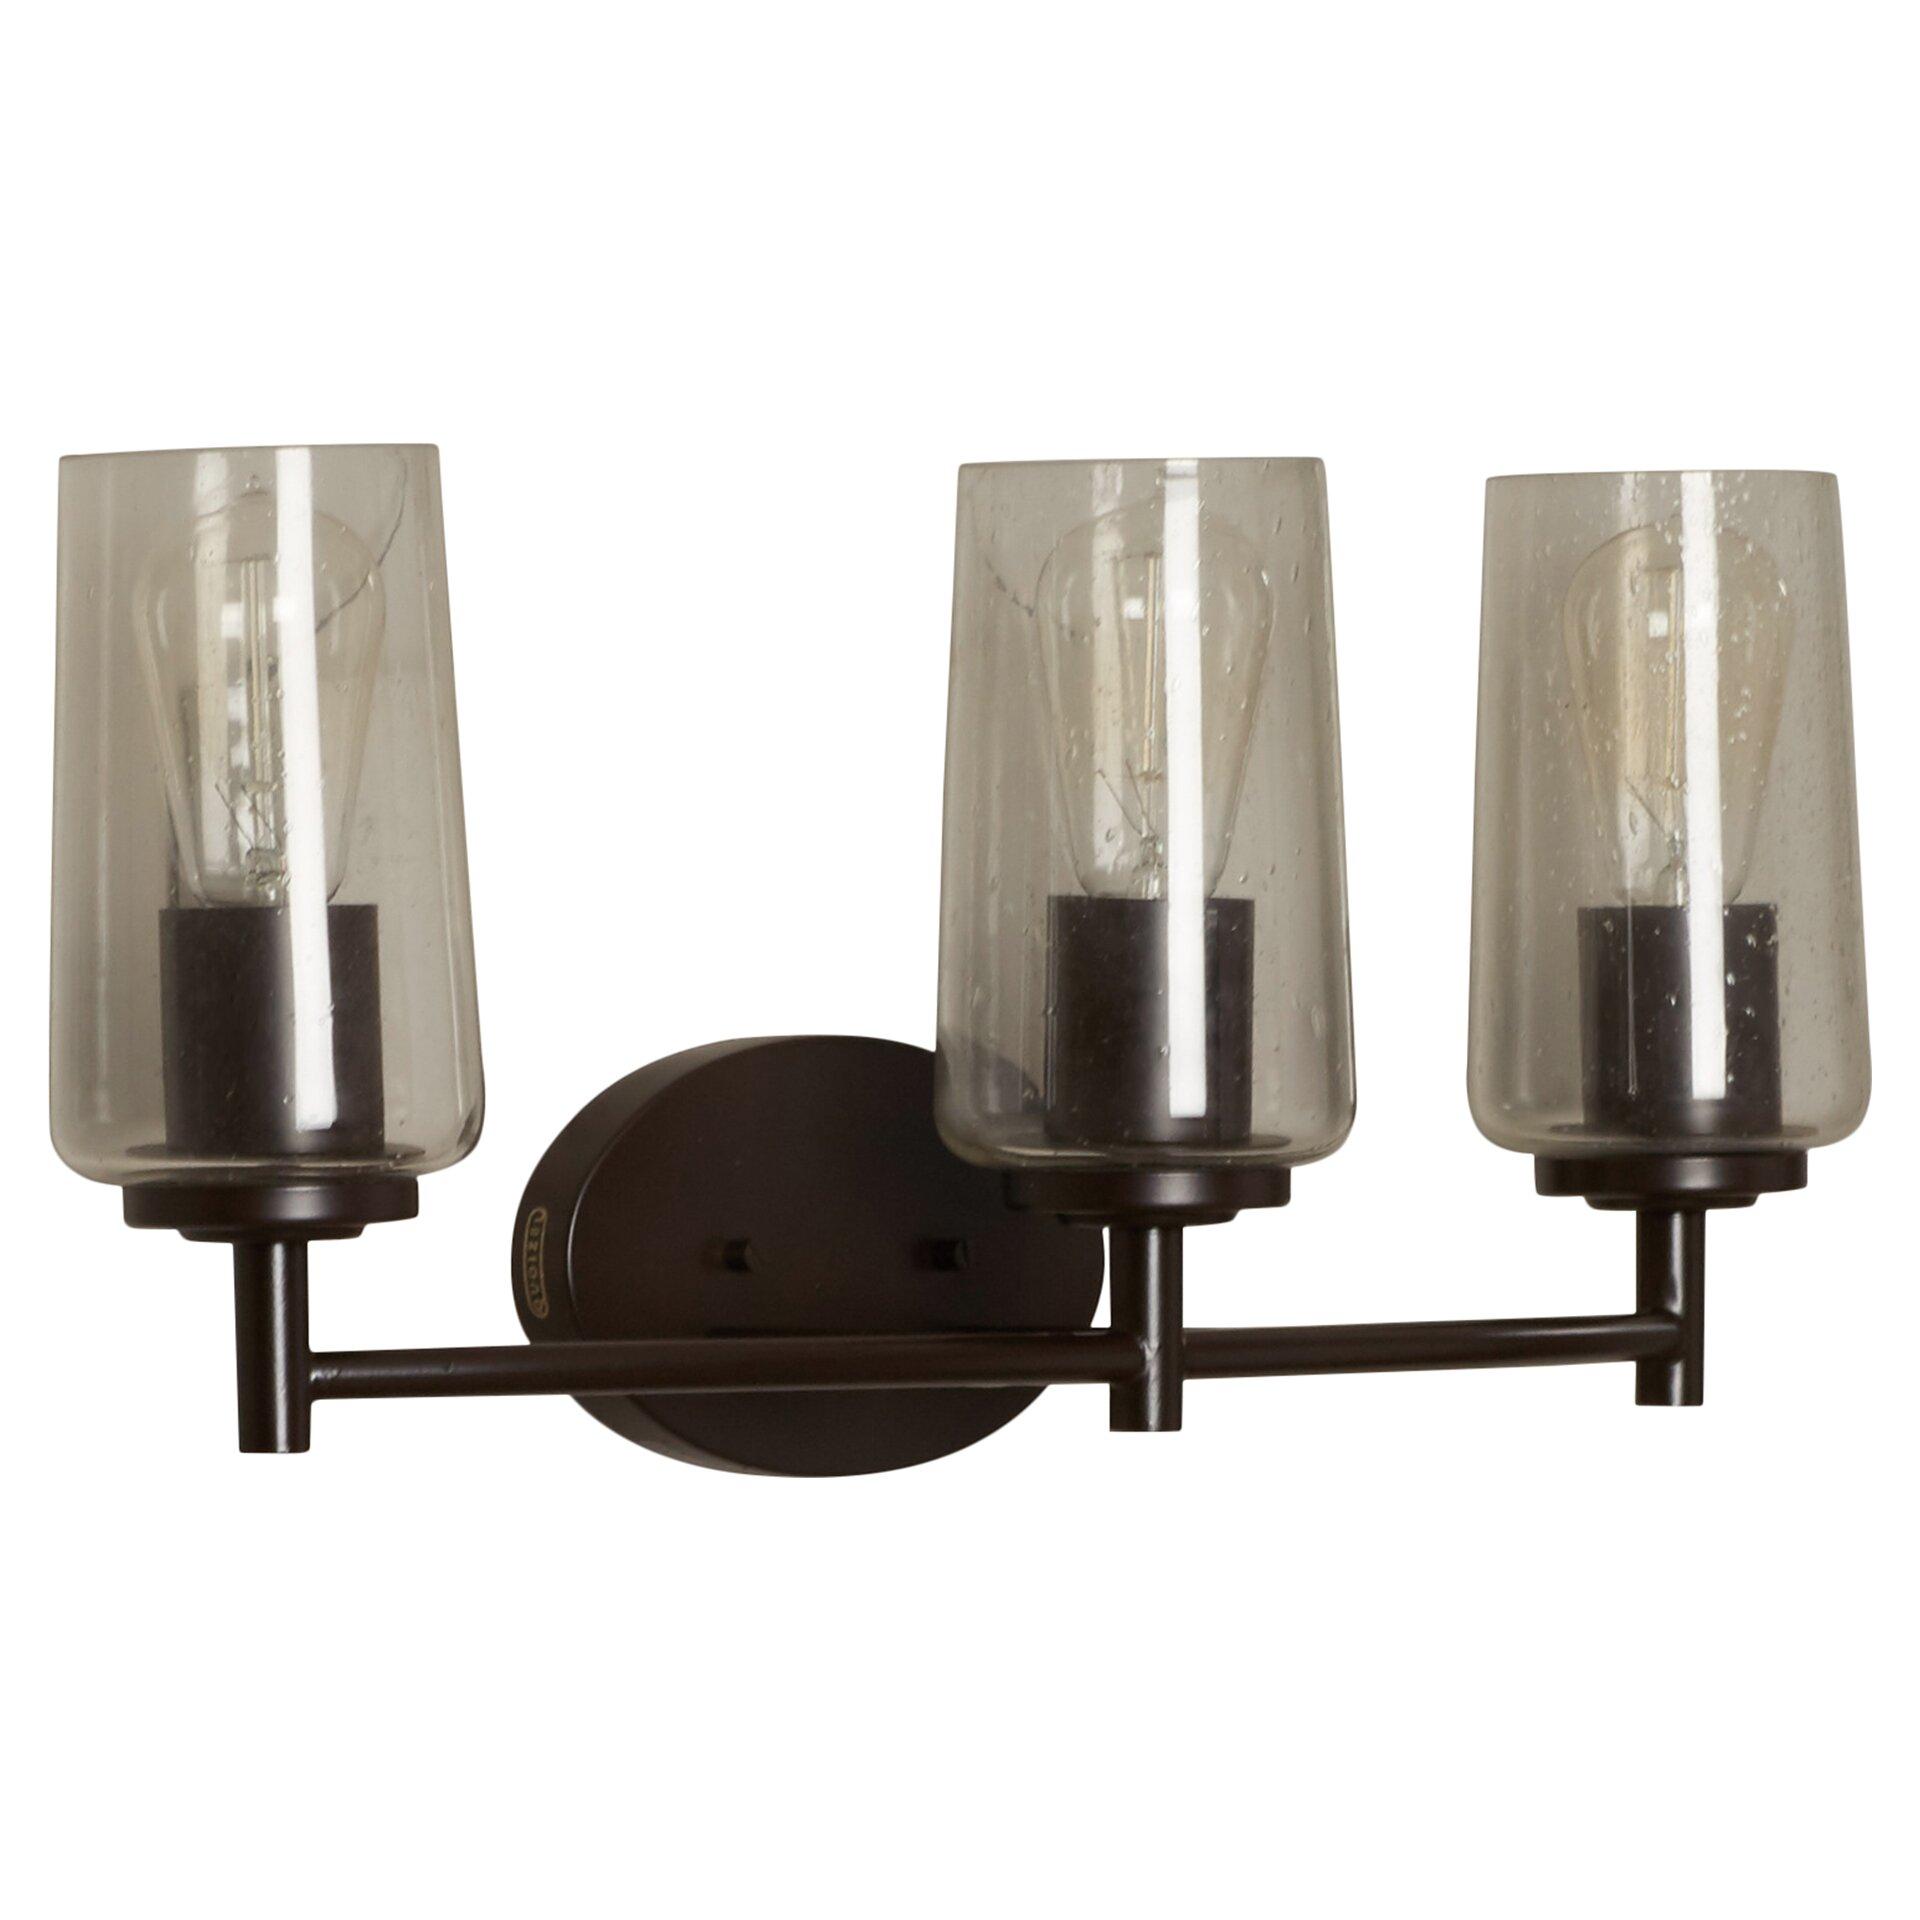 Loring 3 Light Bath Vanity Light by Trent Austin Design